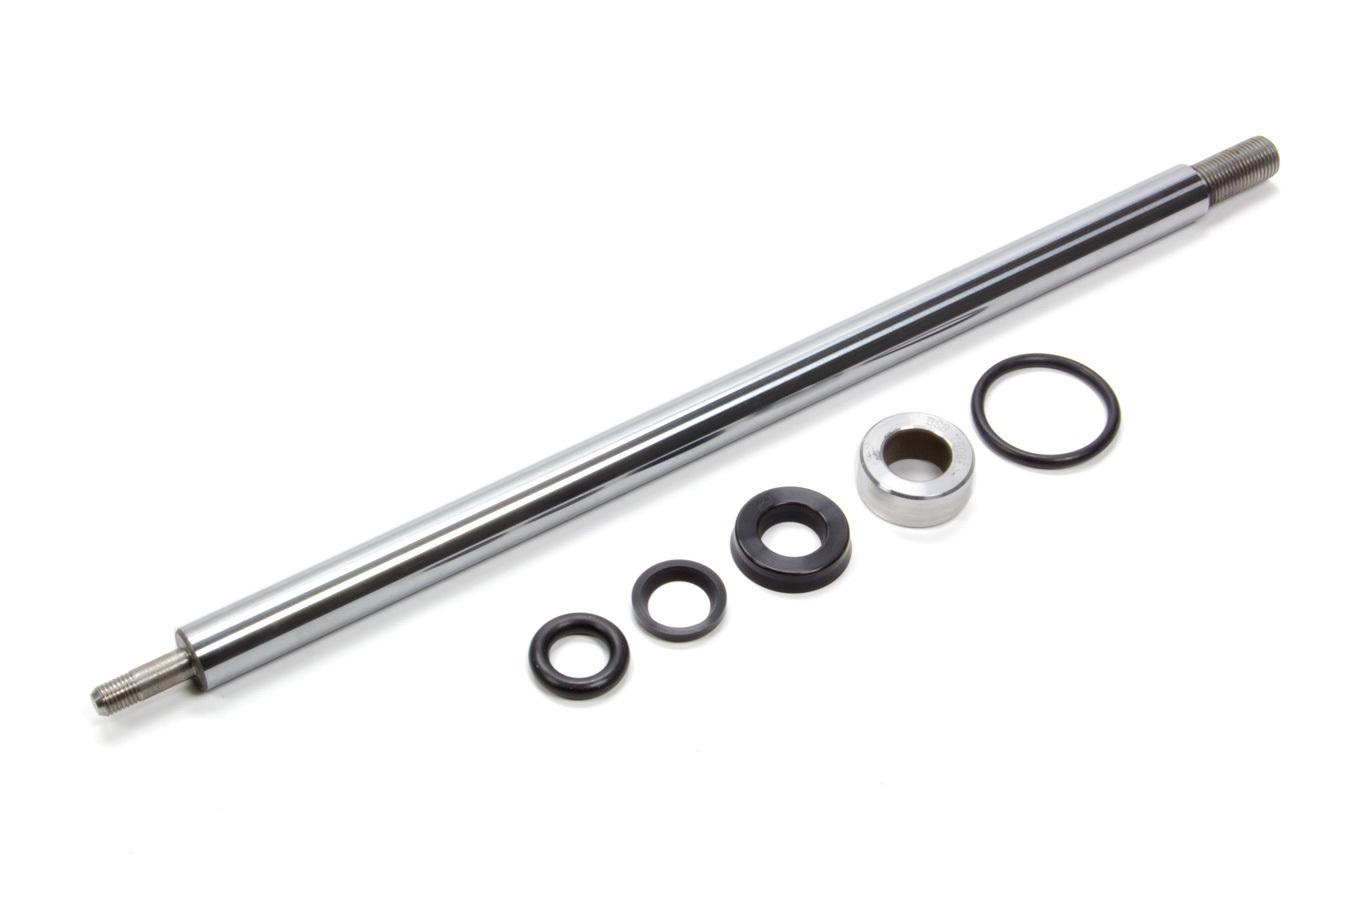 Bsb Manufacturing Rebuilt Kit XD Coilover Eliminator 2in Ext